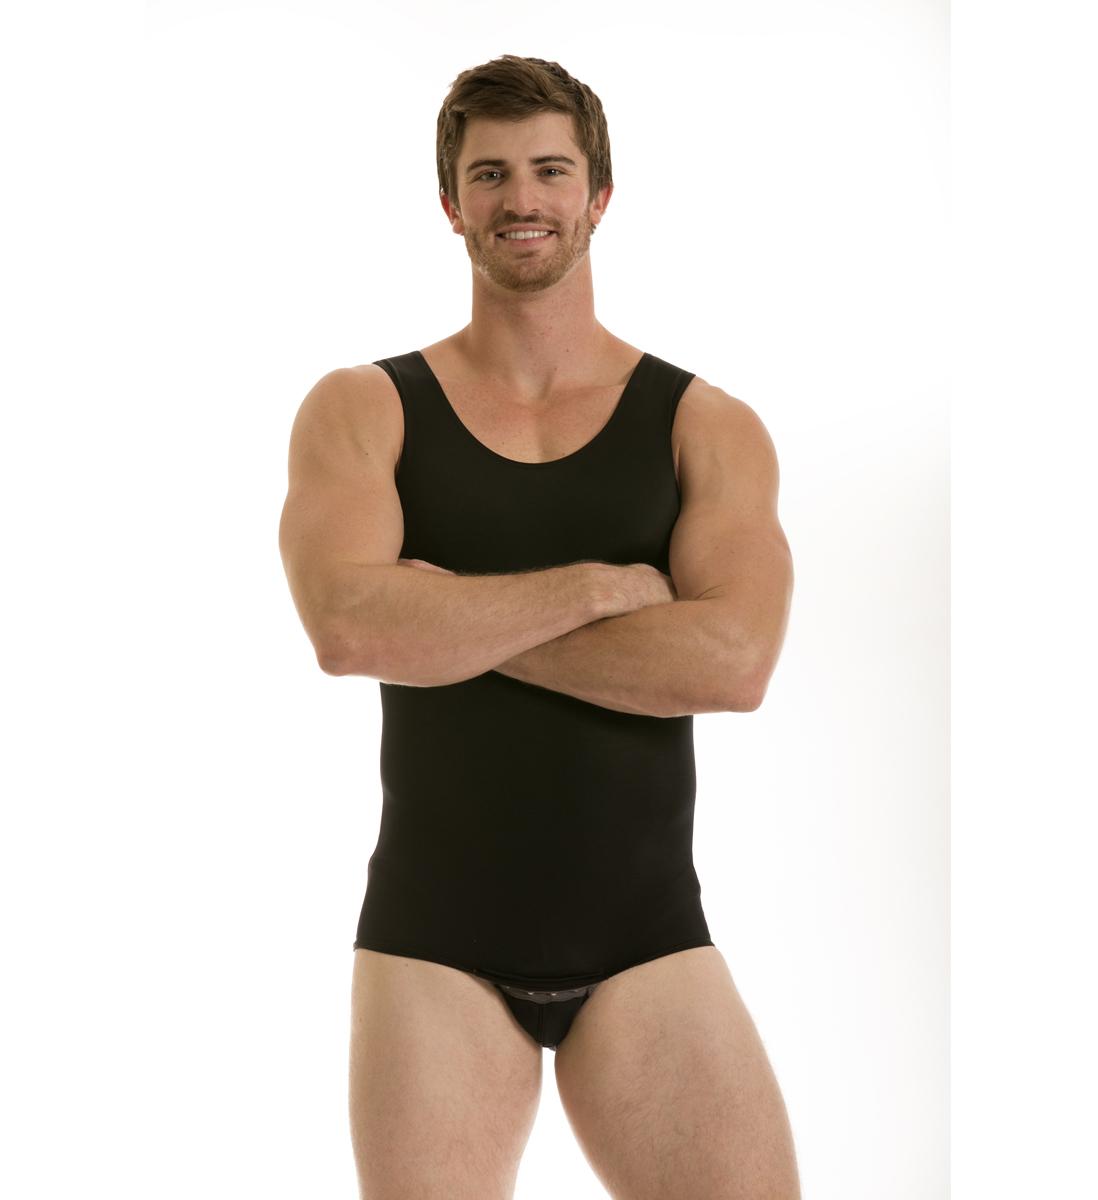 Insta Slim Men's Compression Tank Bodysuit PartNumber: 3ZZVA87264812P MfgPartNumber: MB2006BKMD